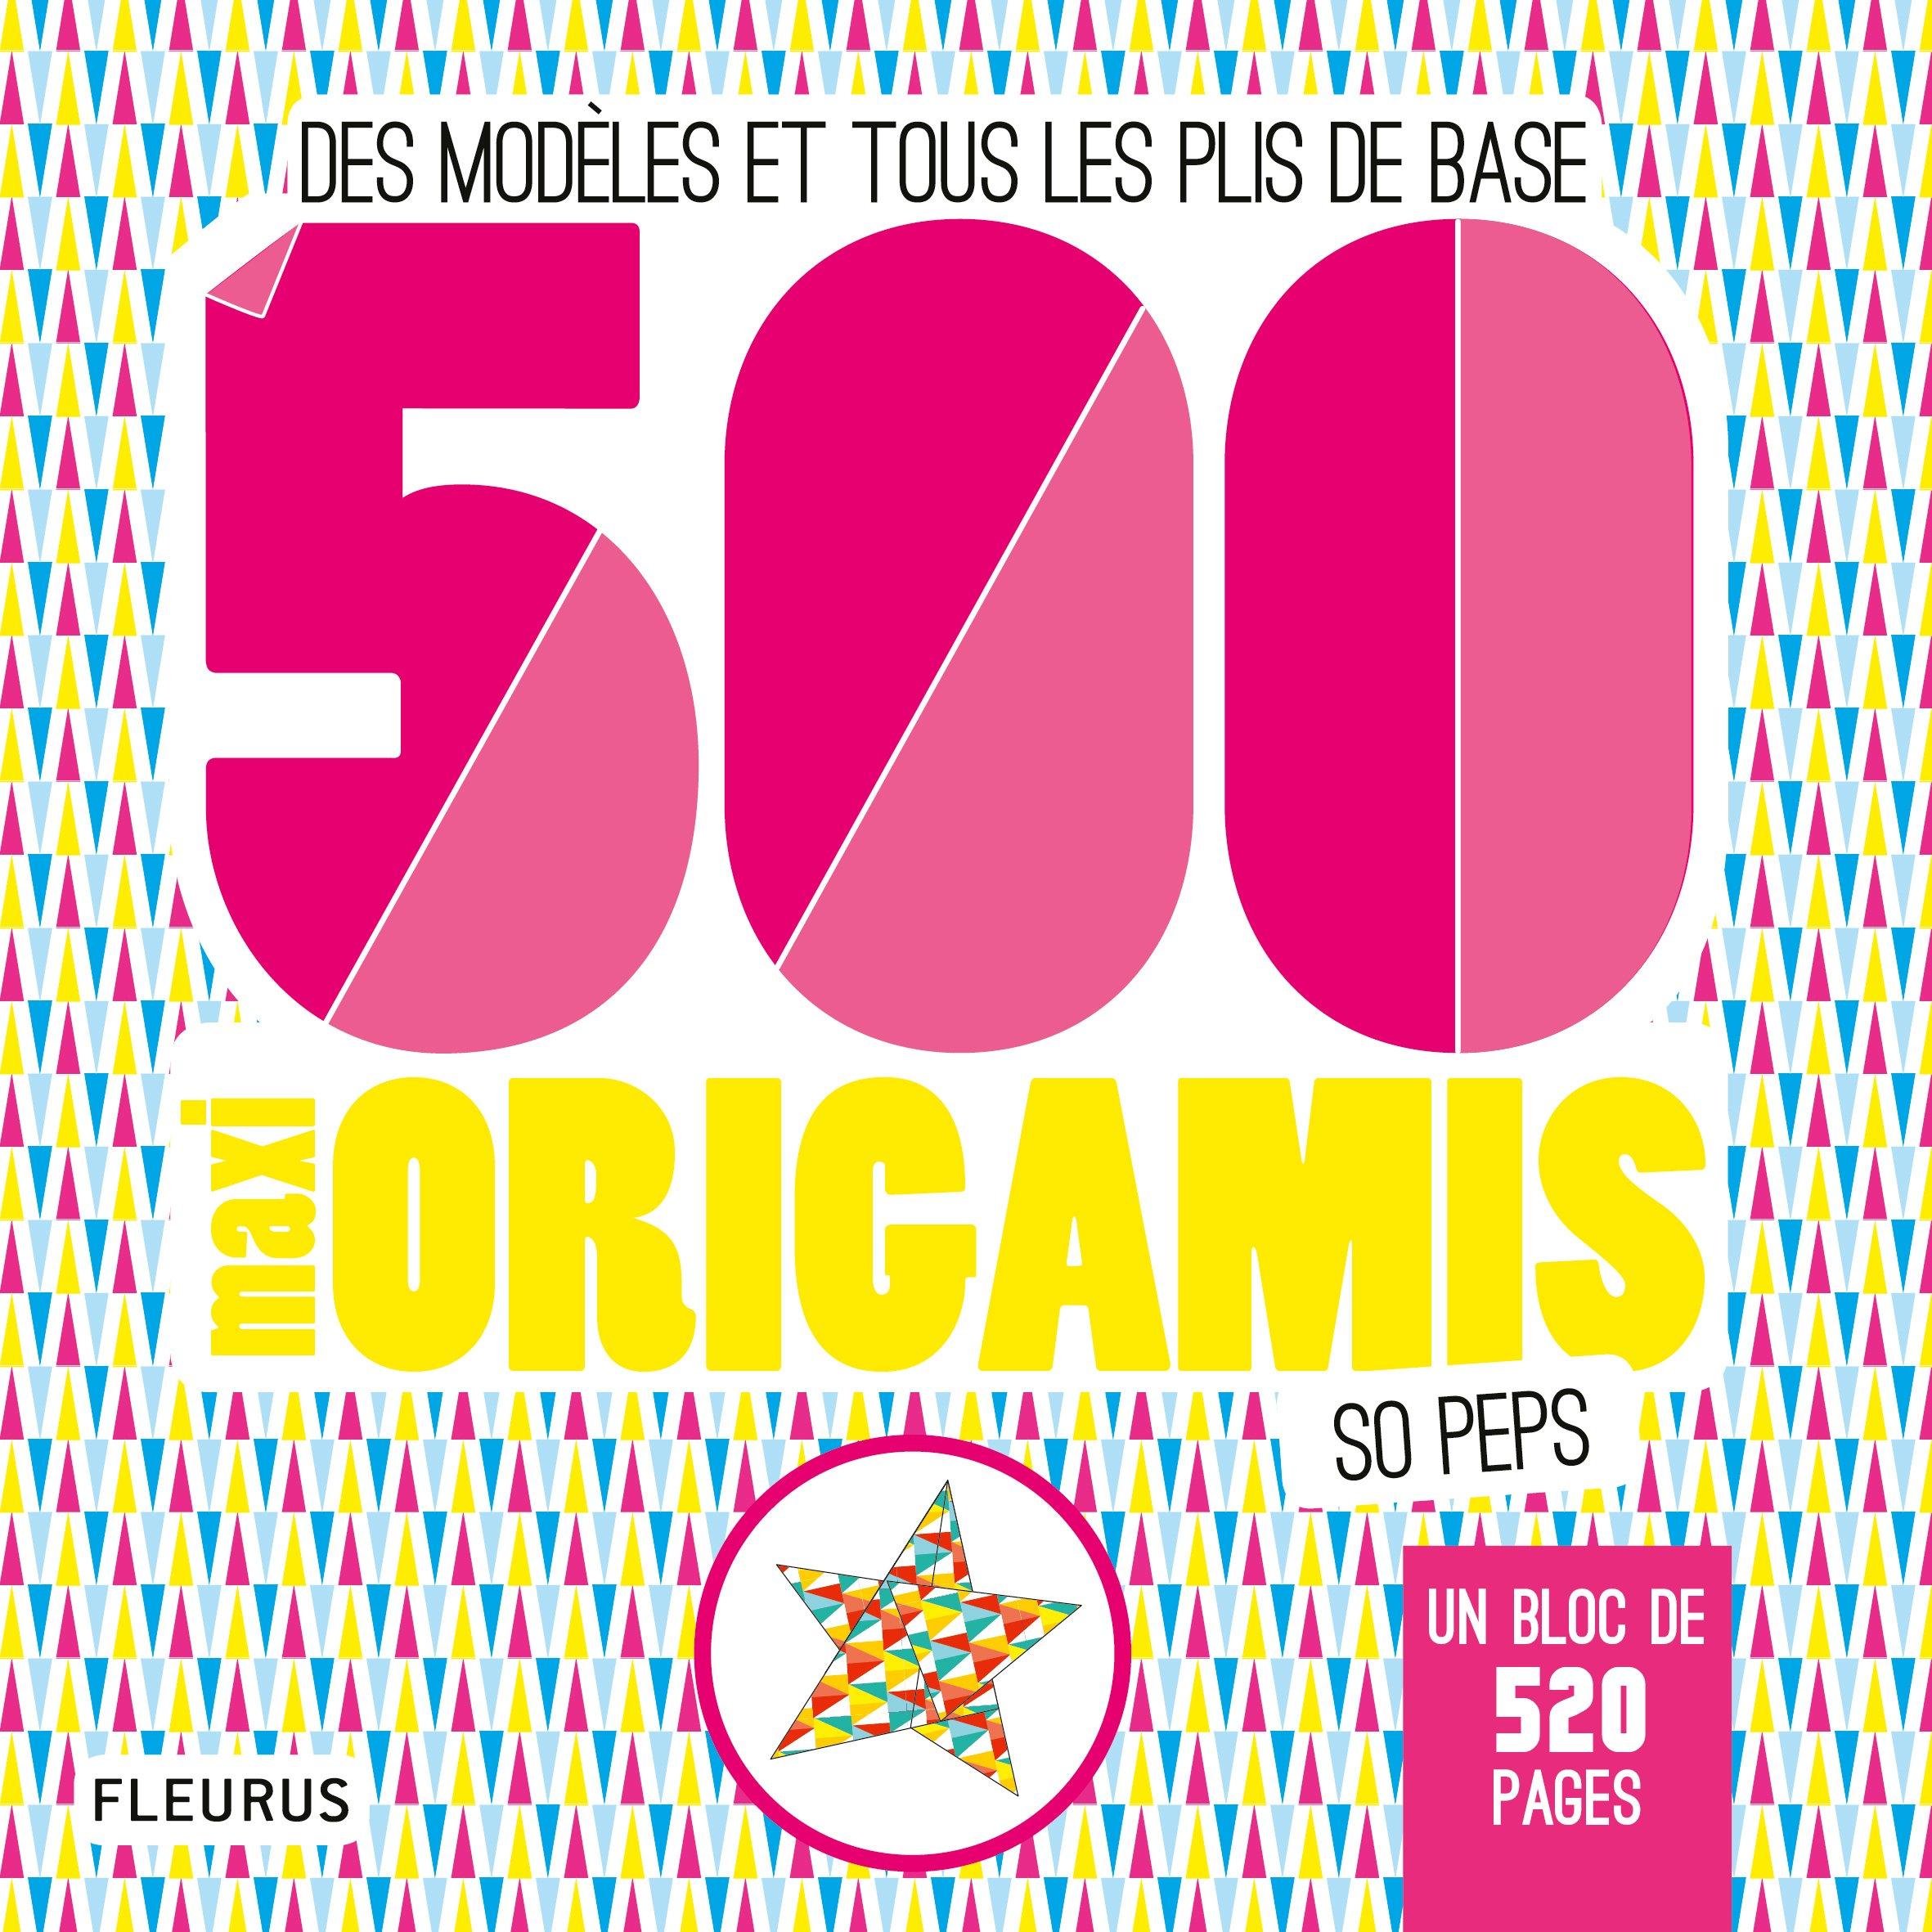 Amazon.fr - 500 maxi origamis so peps : Des modèles et tous les plis de base  - Mayumi Jezewski - Livres